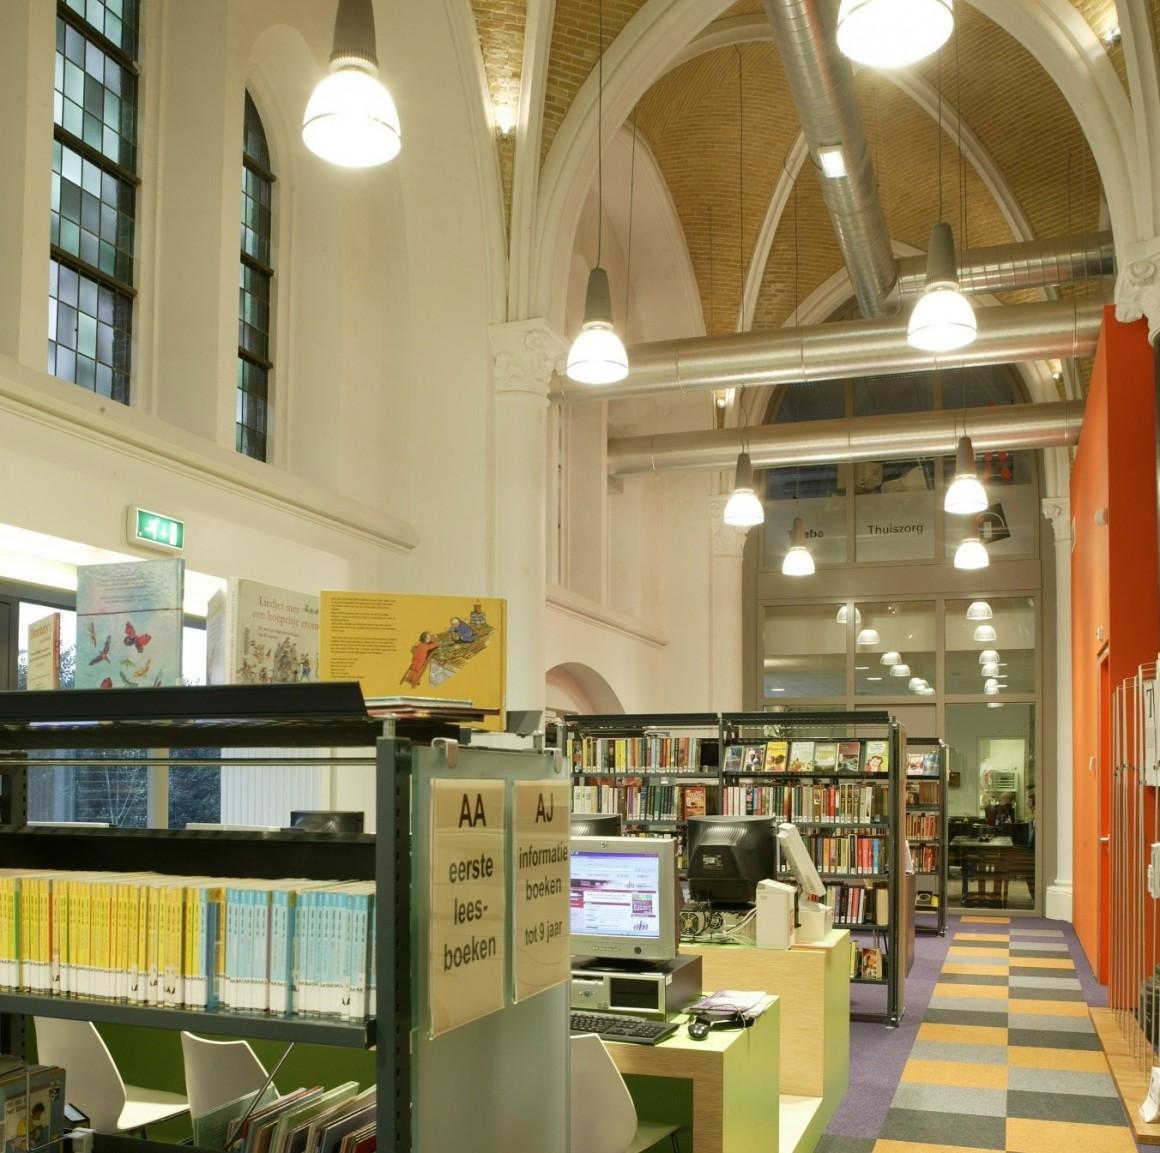 __6c lokaal bibliotheek interieur